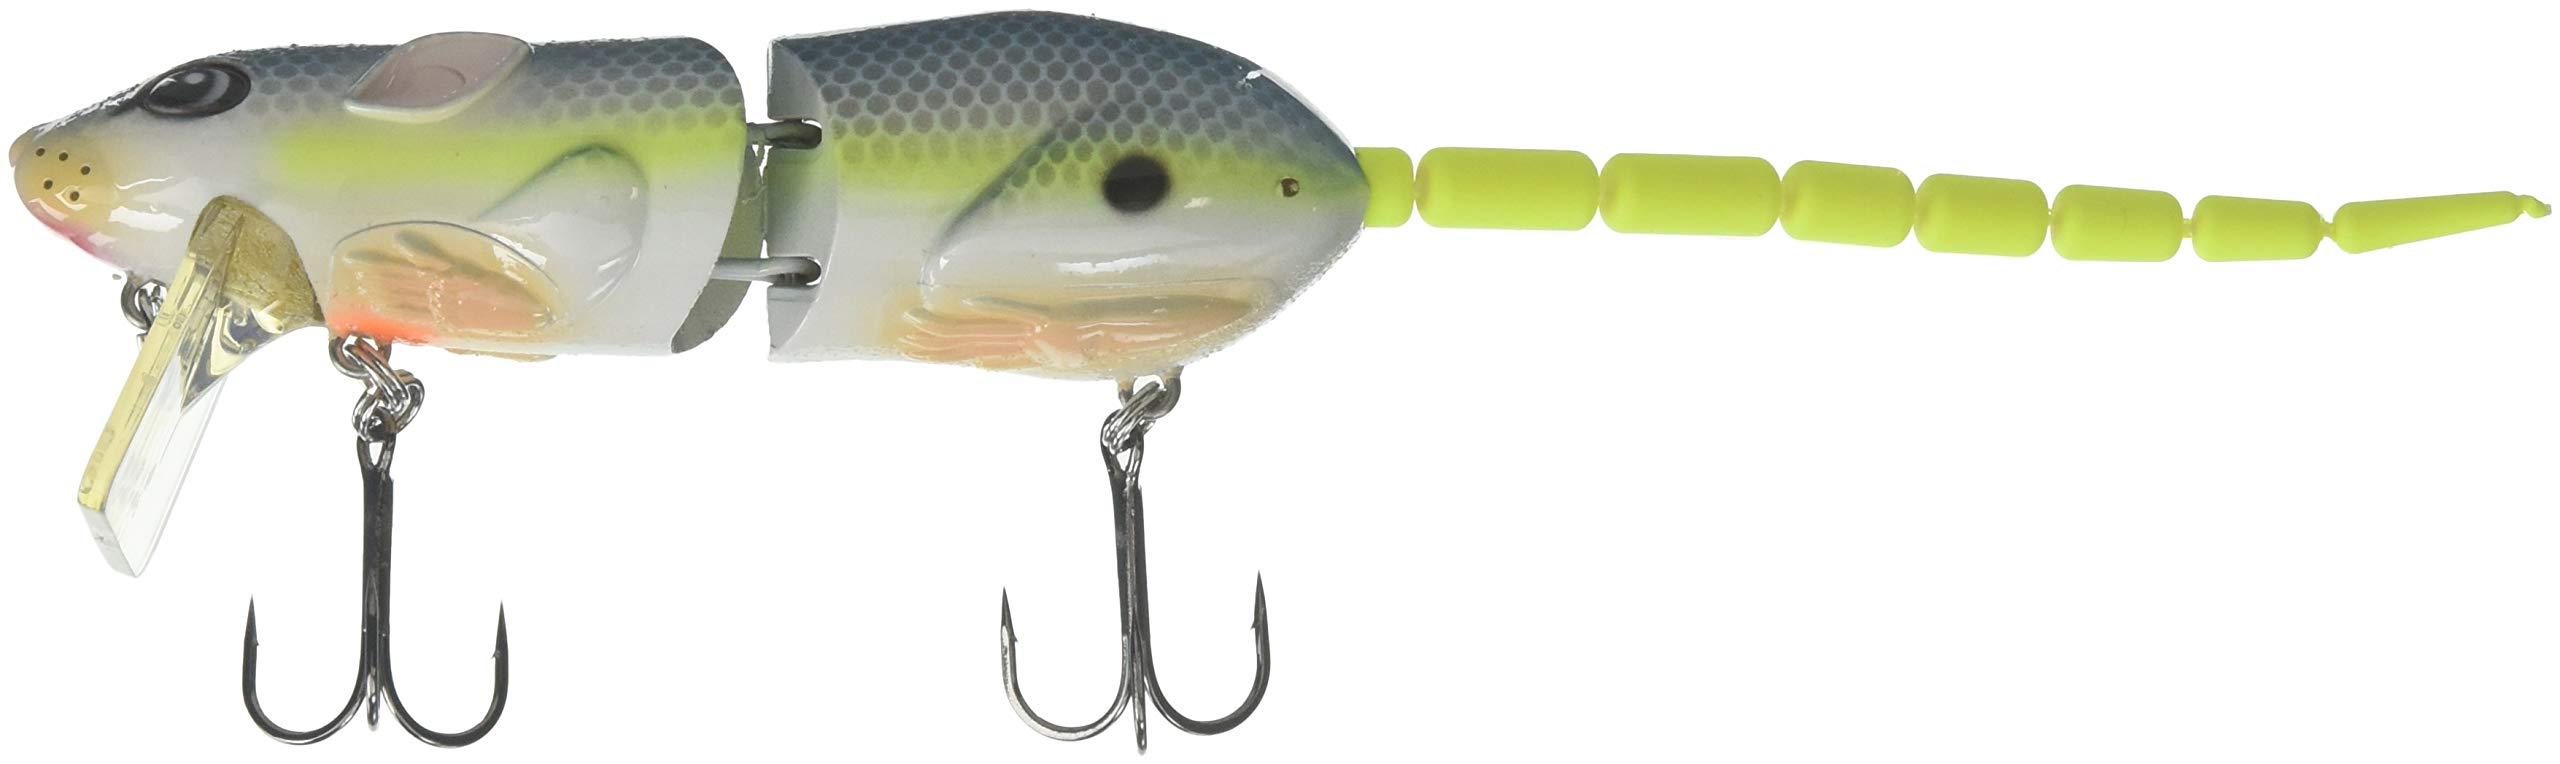 Spro SRT30Z1NSD BBZ-1 Rat 30 Fishing Bait